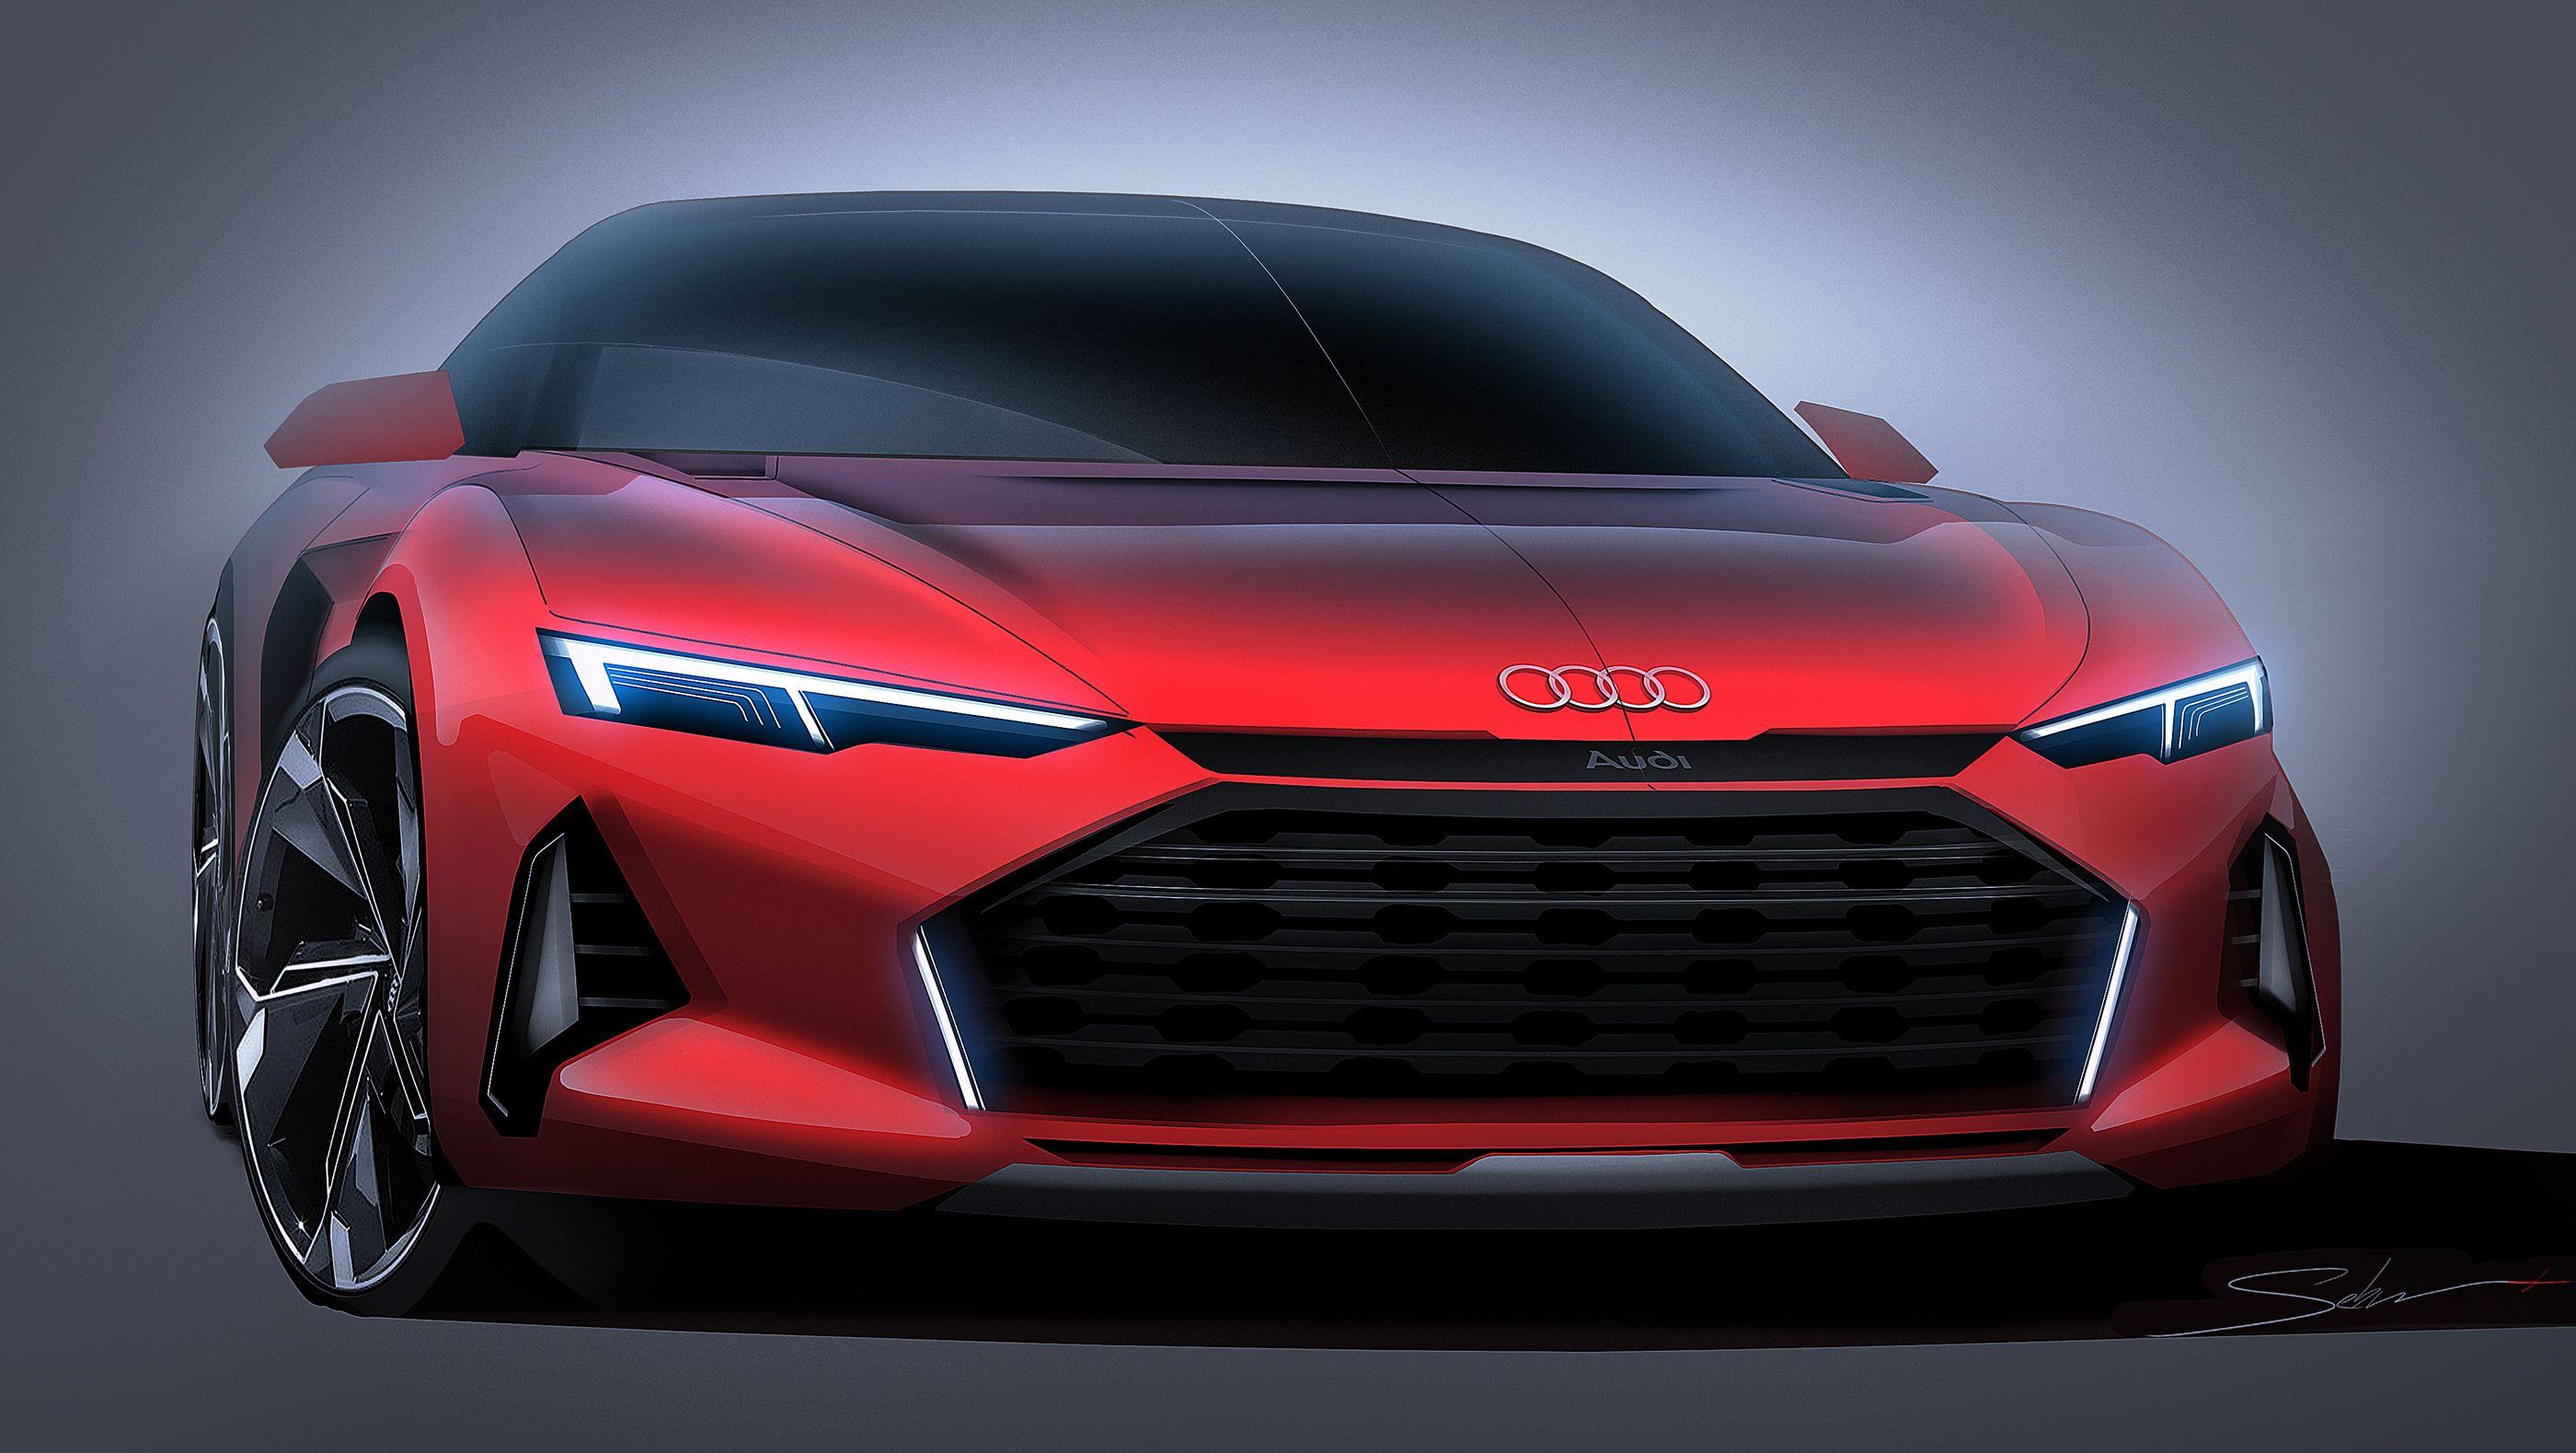 Behance :: For You | Audi car models, New audi car, Audi cars